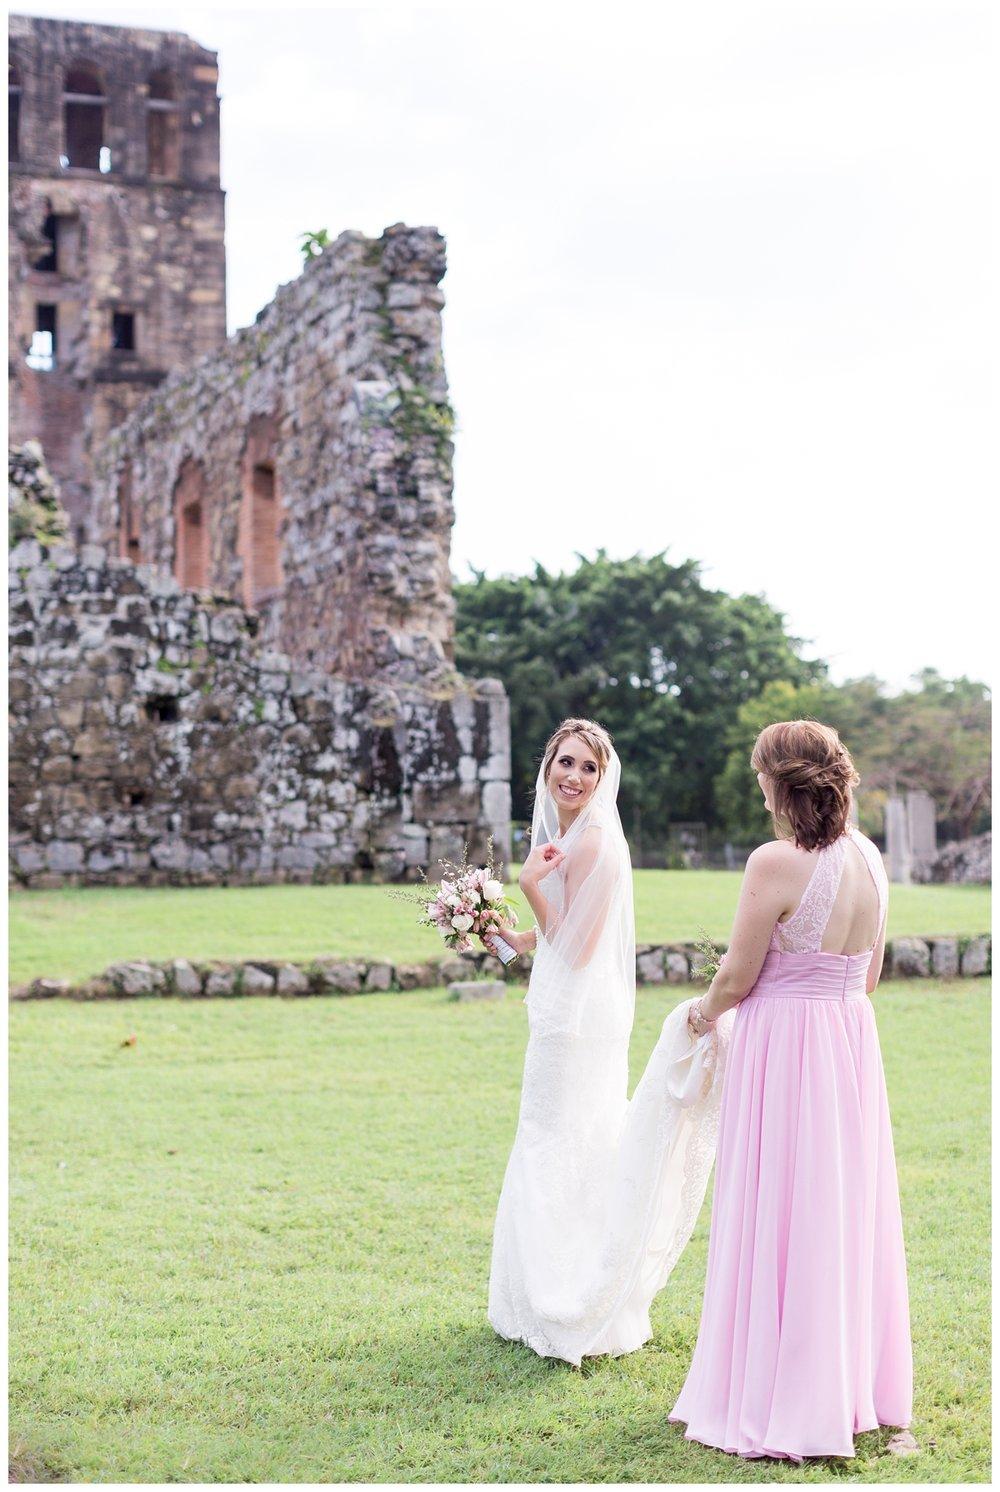 Panama-Destination-Wedding-Photographer_0140-1.jpg